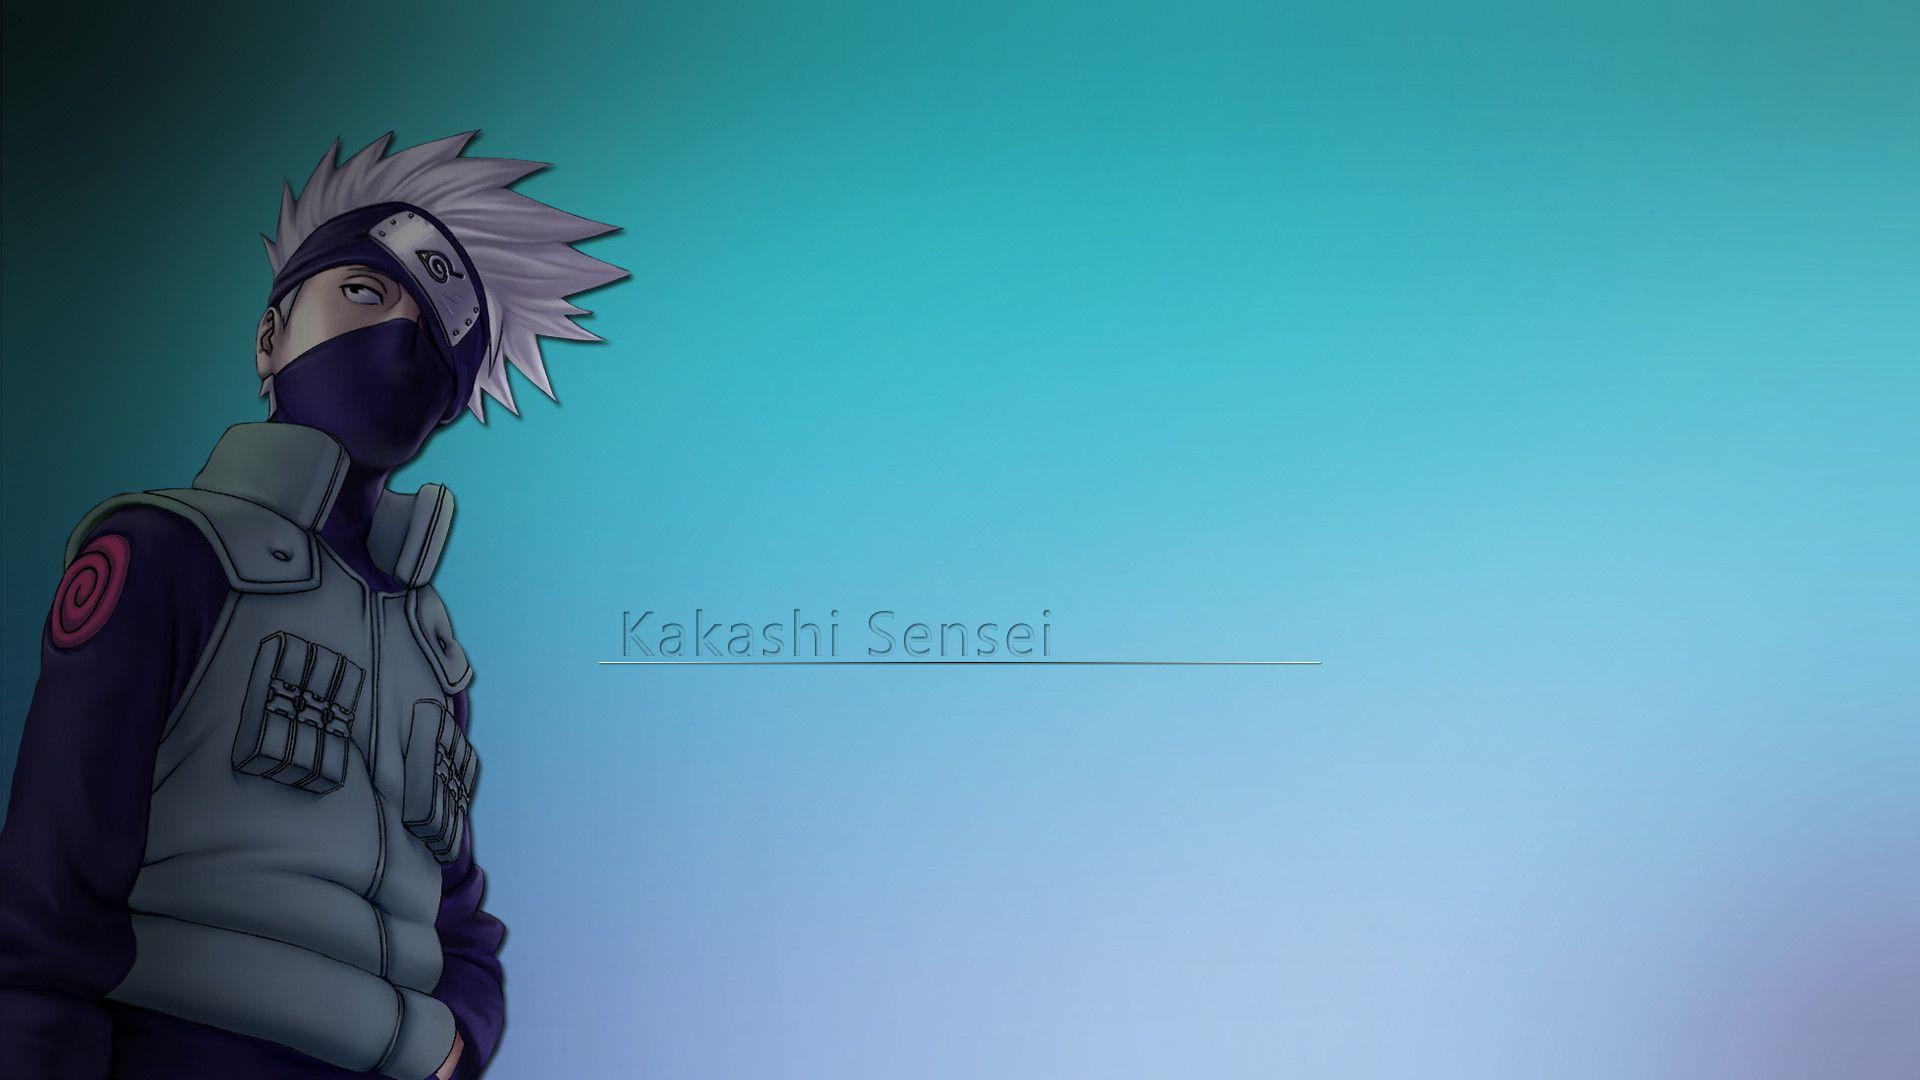 kakashi wallpapers - photo #34